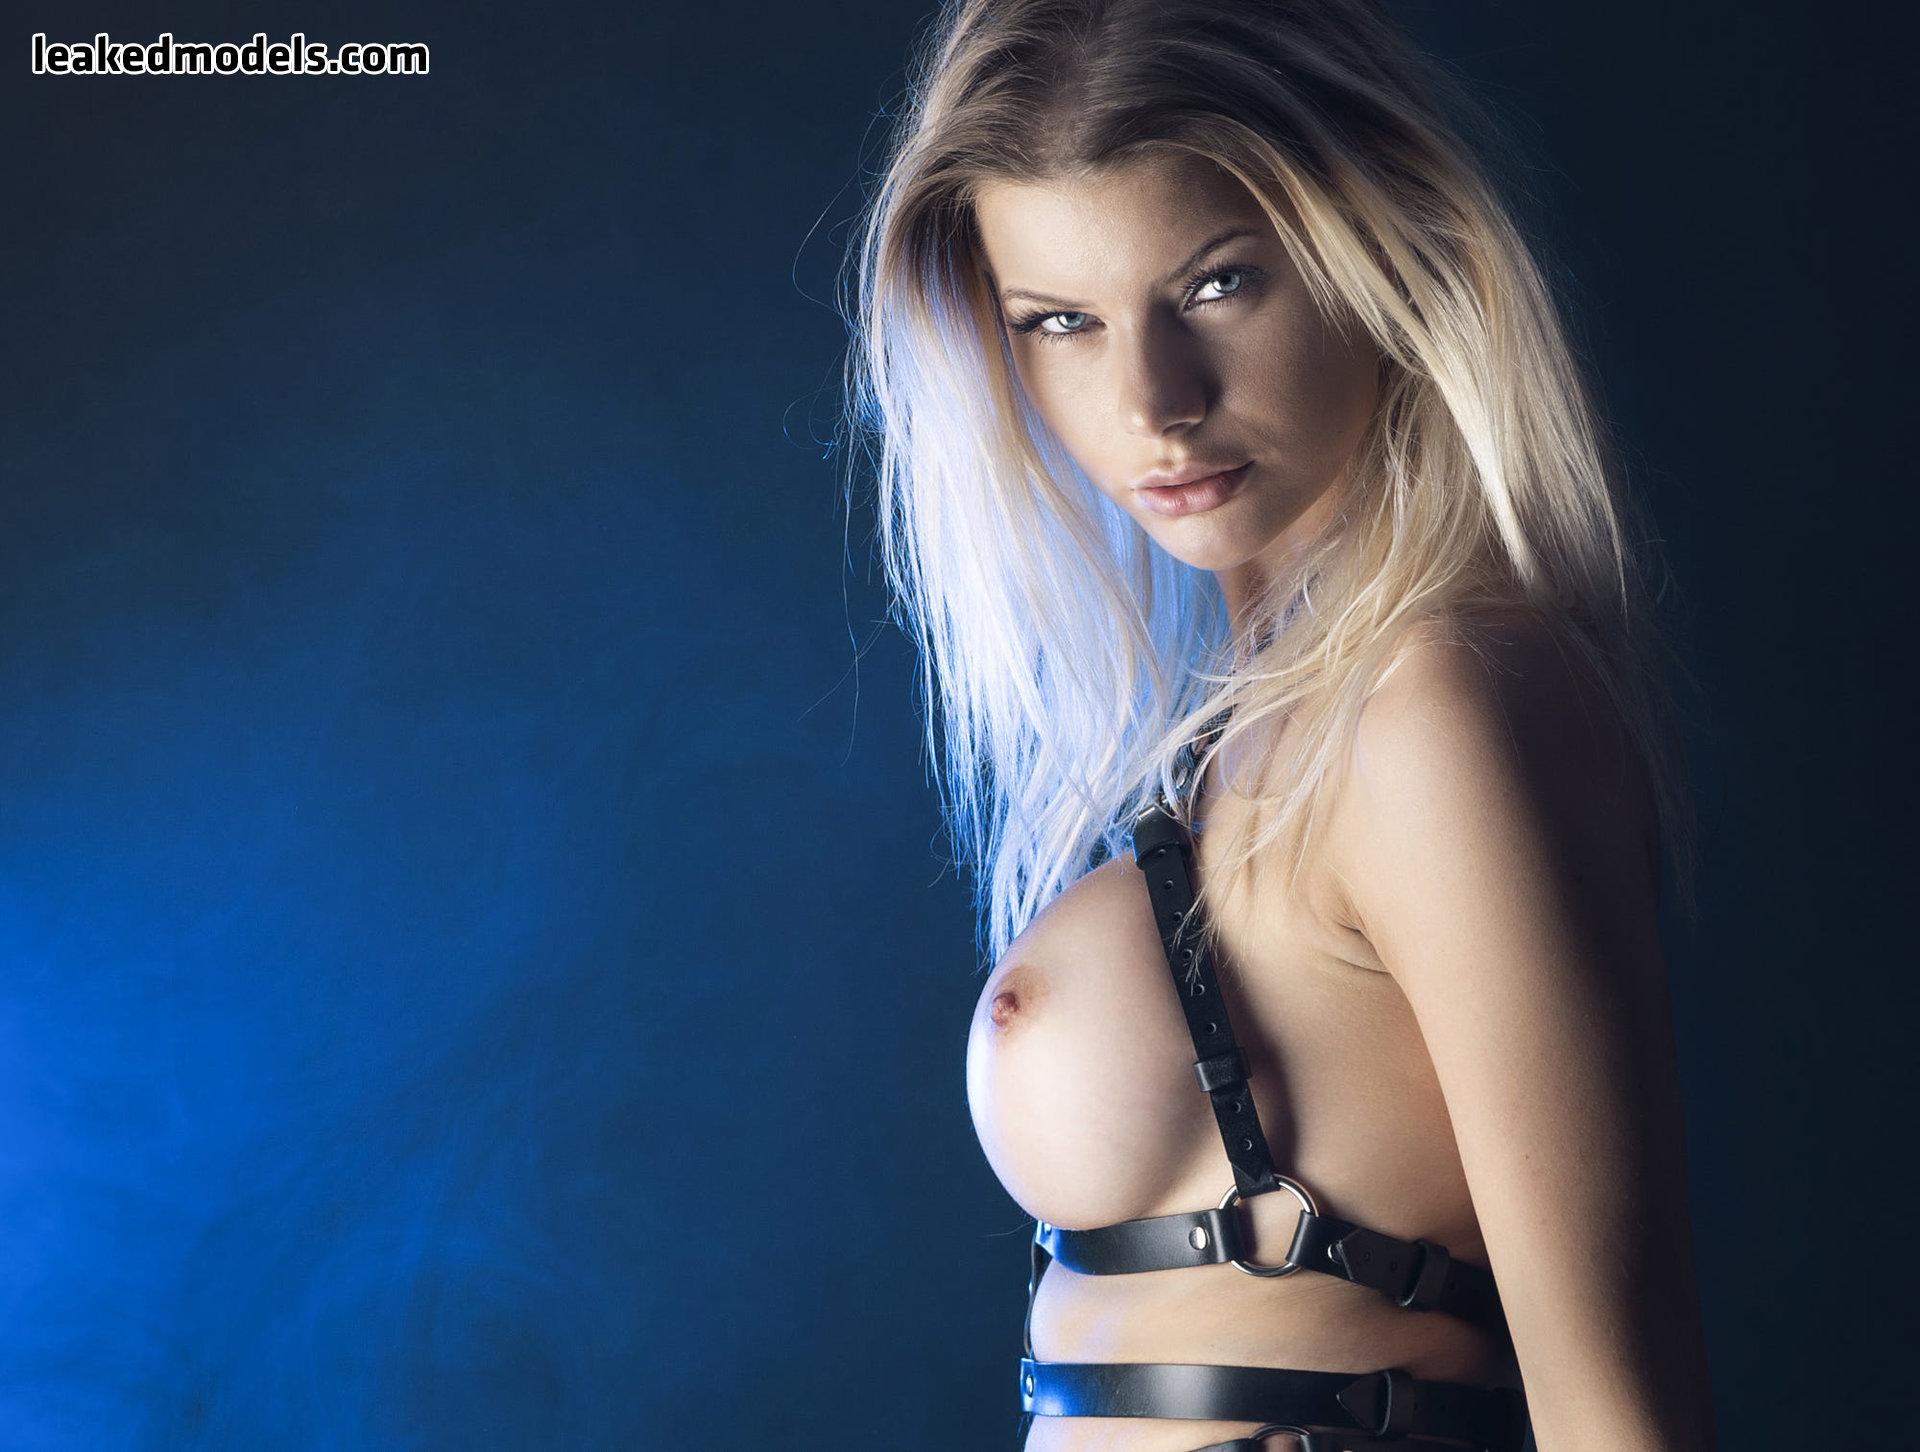 honeybabesugarpiie killeryina leaked nude leakedmodels.com 0020 - Viktoria – Honeybabesugarpiie killeryina OnlyFans Nude Leaks (30 Photos)